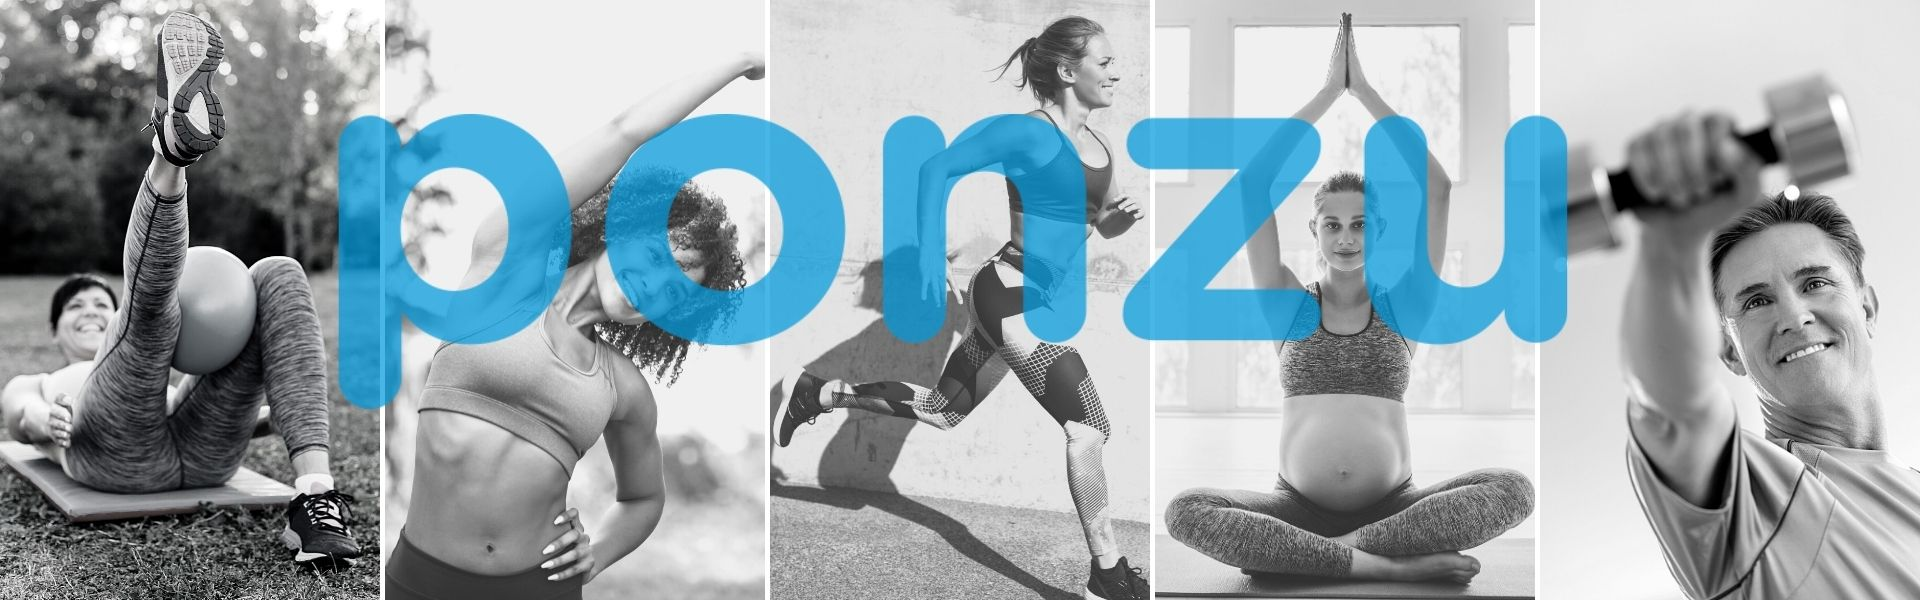 New platform ponzu puts fun back into fitness